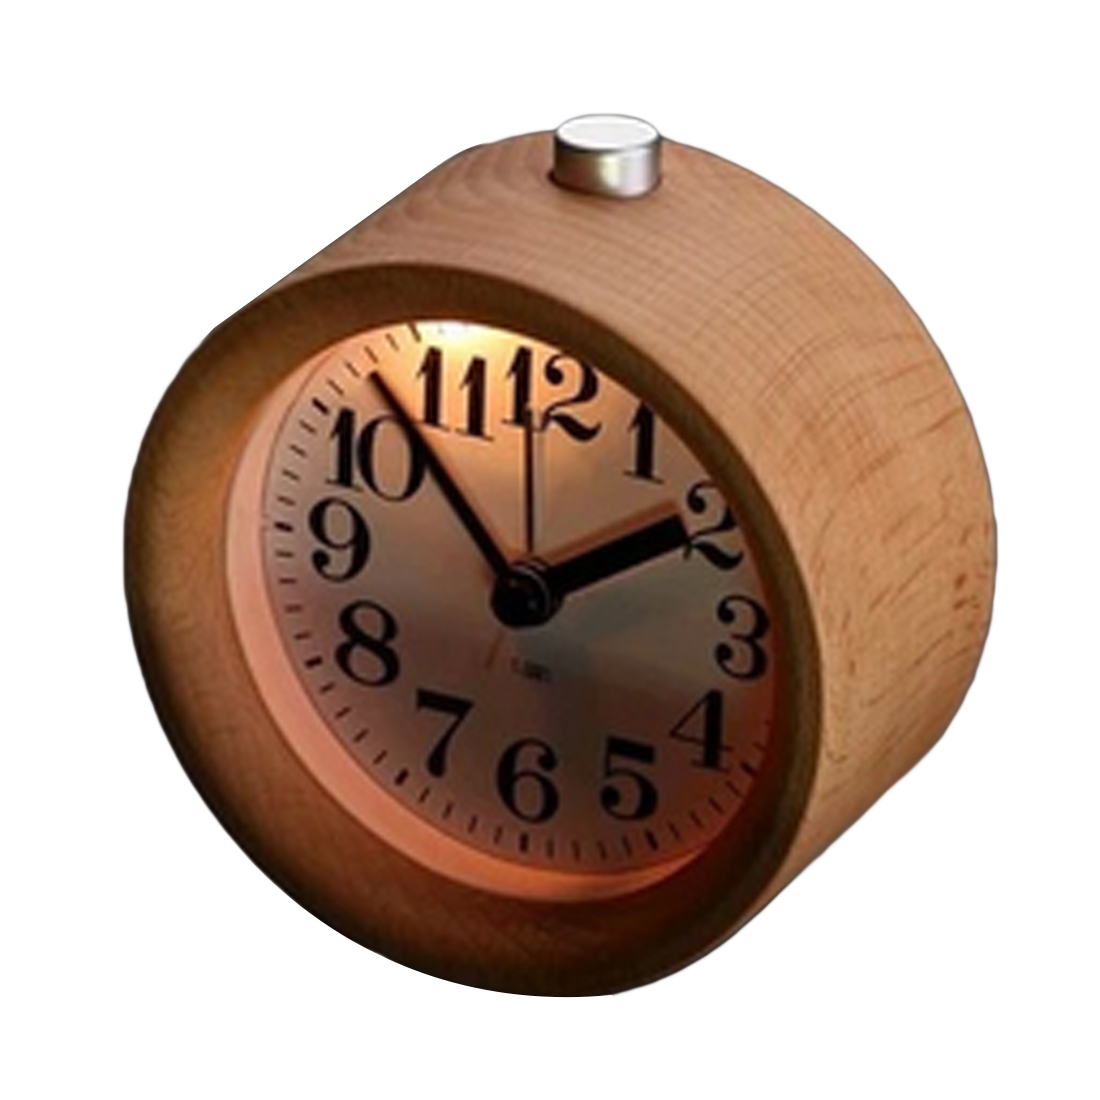 Useful Wooden Alarm Clock Electronic Desktop Clock Digital Clock Circular No Ticking Snooze Backlight Wood Table Watch